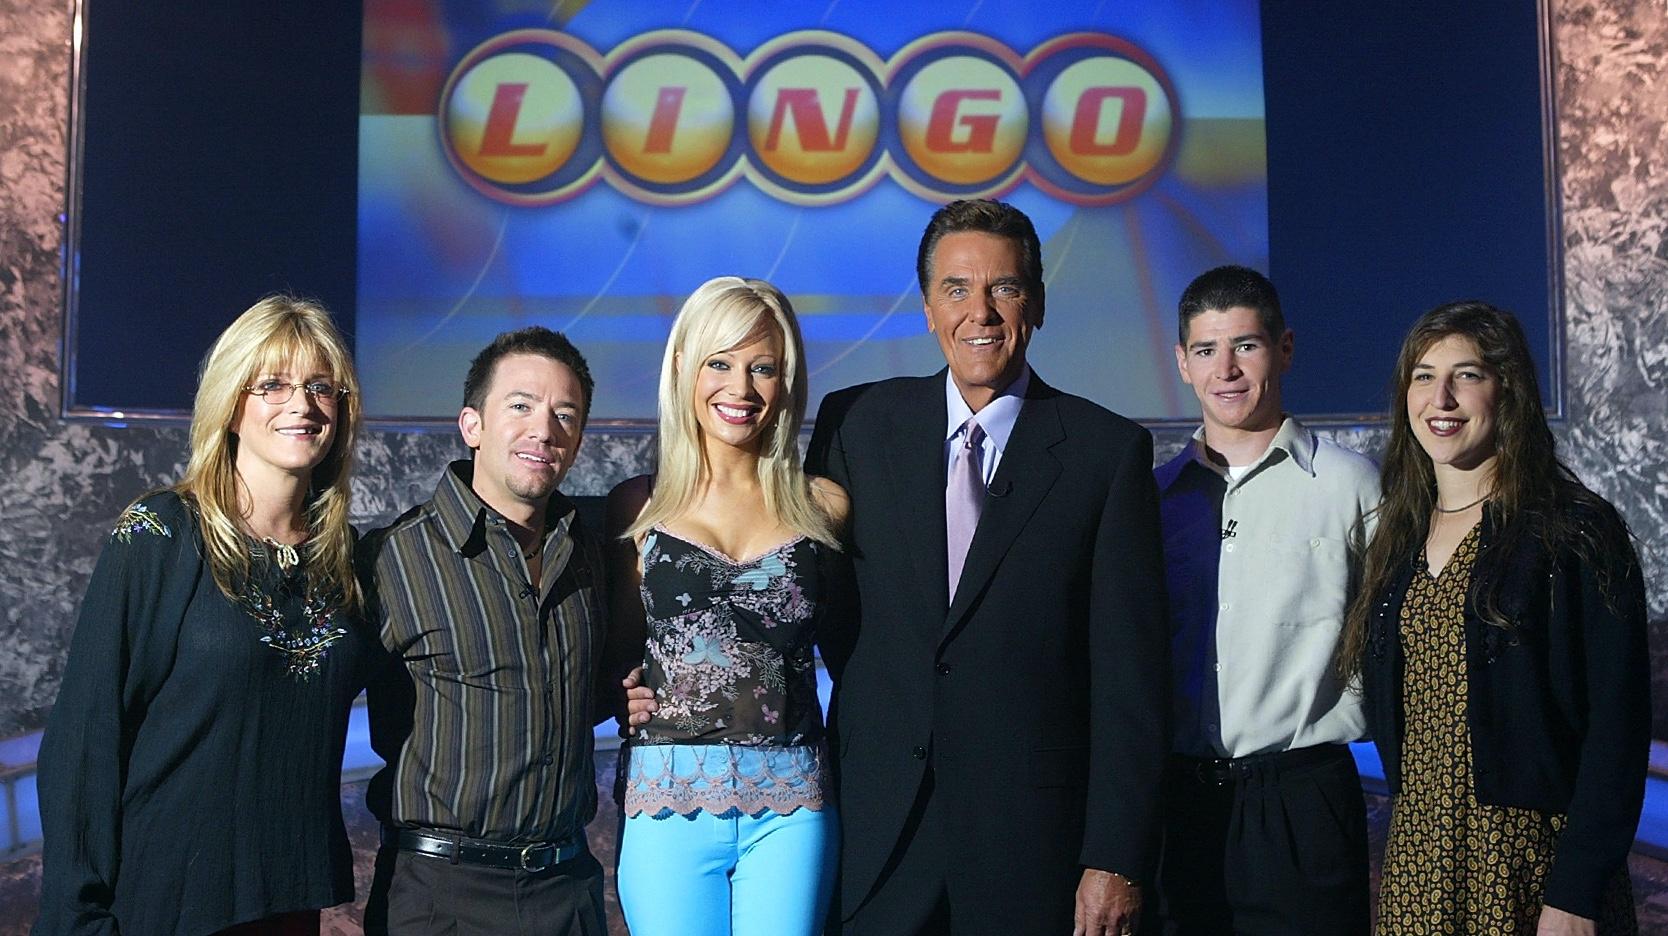 LINGO with Chuck Woolery